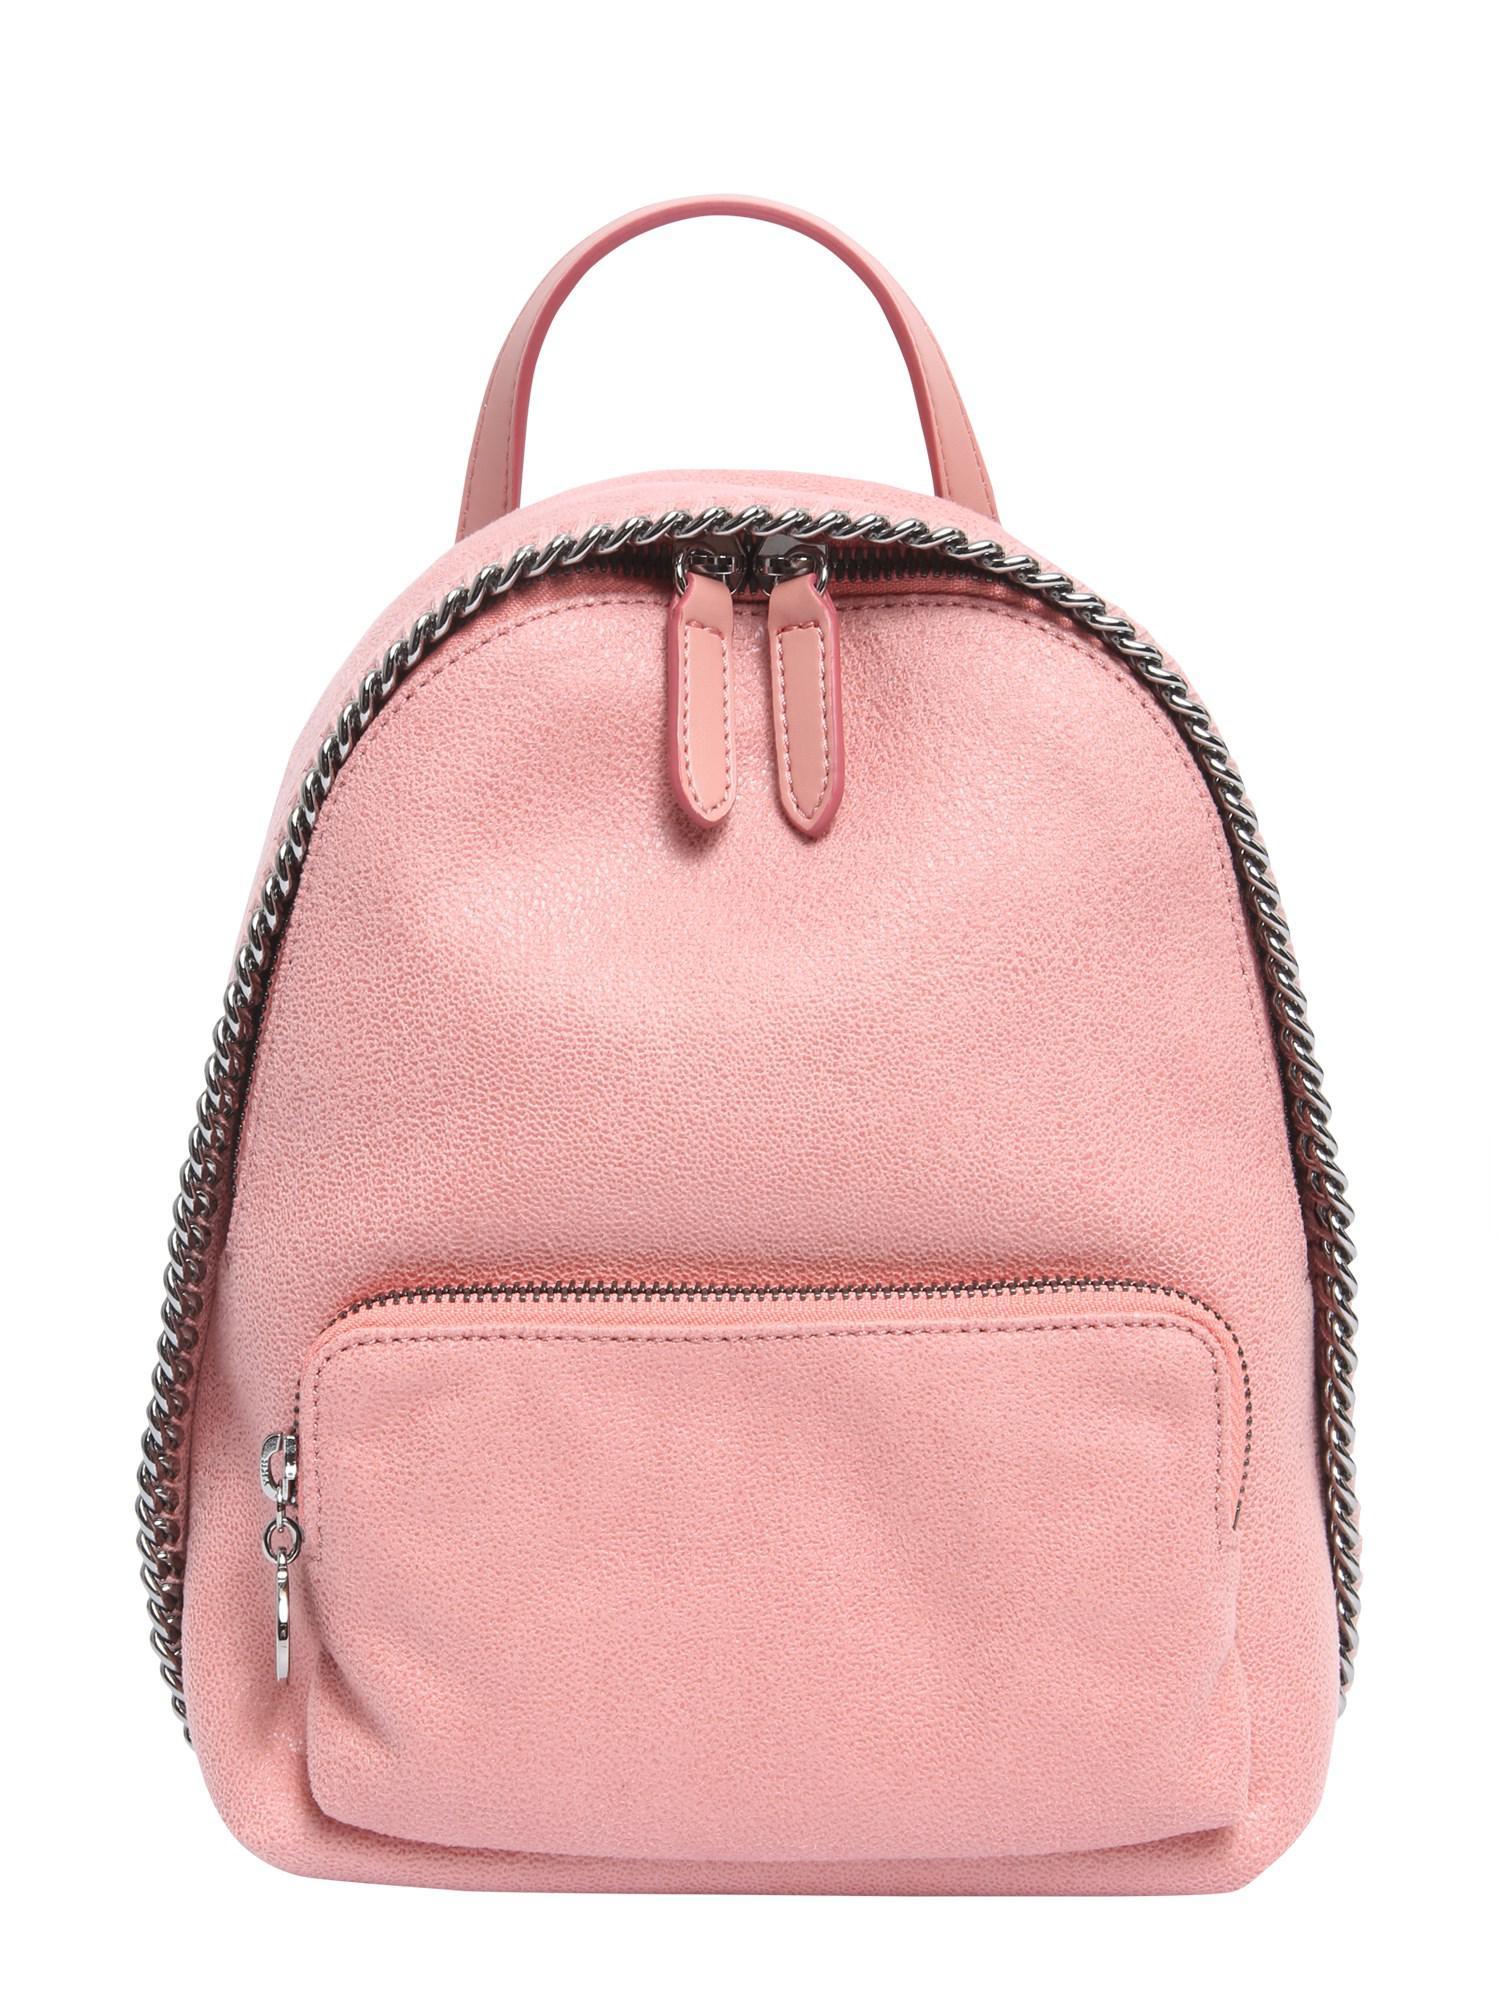 737e2a5aa34b Stella Mccartney Falabella Shaggy Deer Mini Backpack in Pink - Lyst